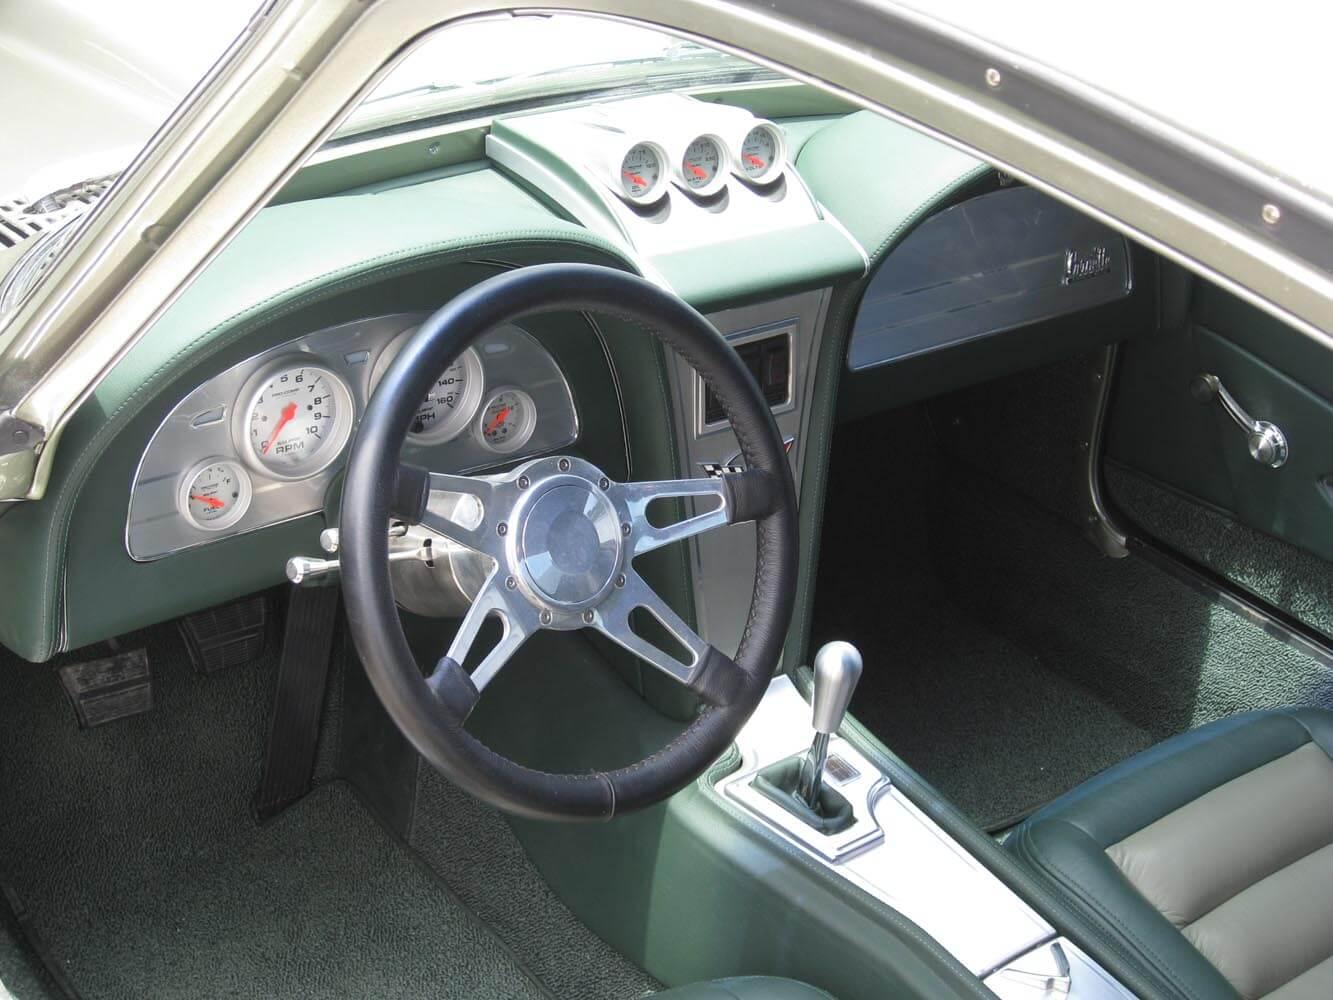 bill and char s 1967 chevy corvette interior kidd darrin 39 s custom cars. Black Bedroom Furniture Sets. Home Design Ideas